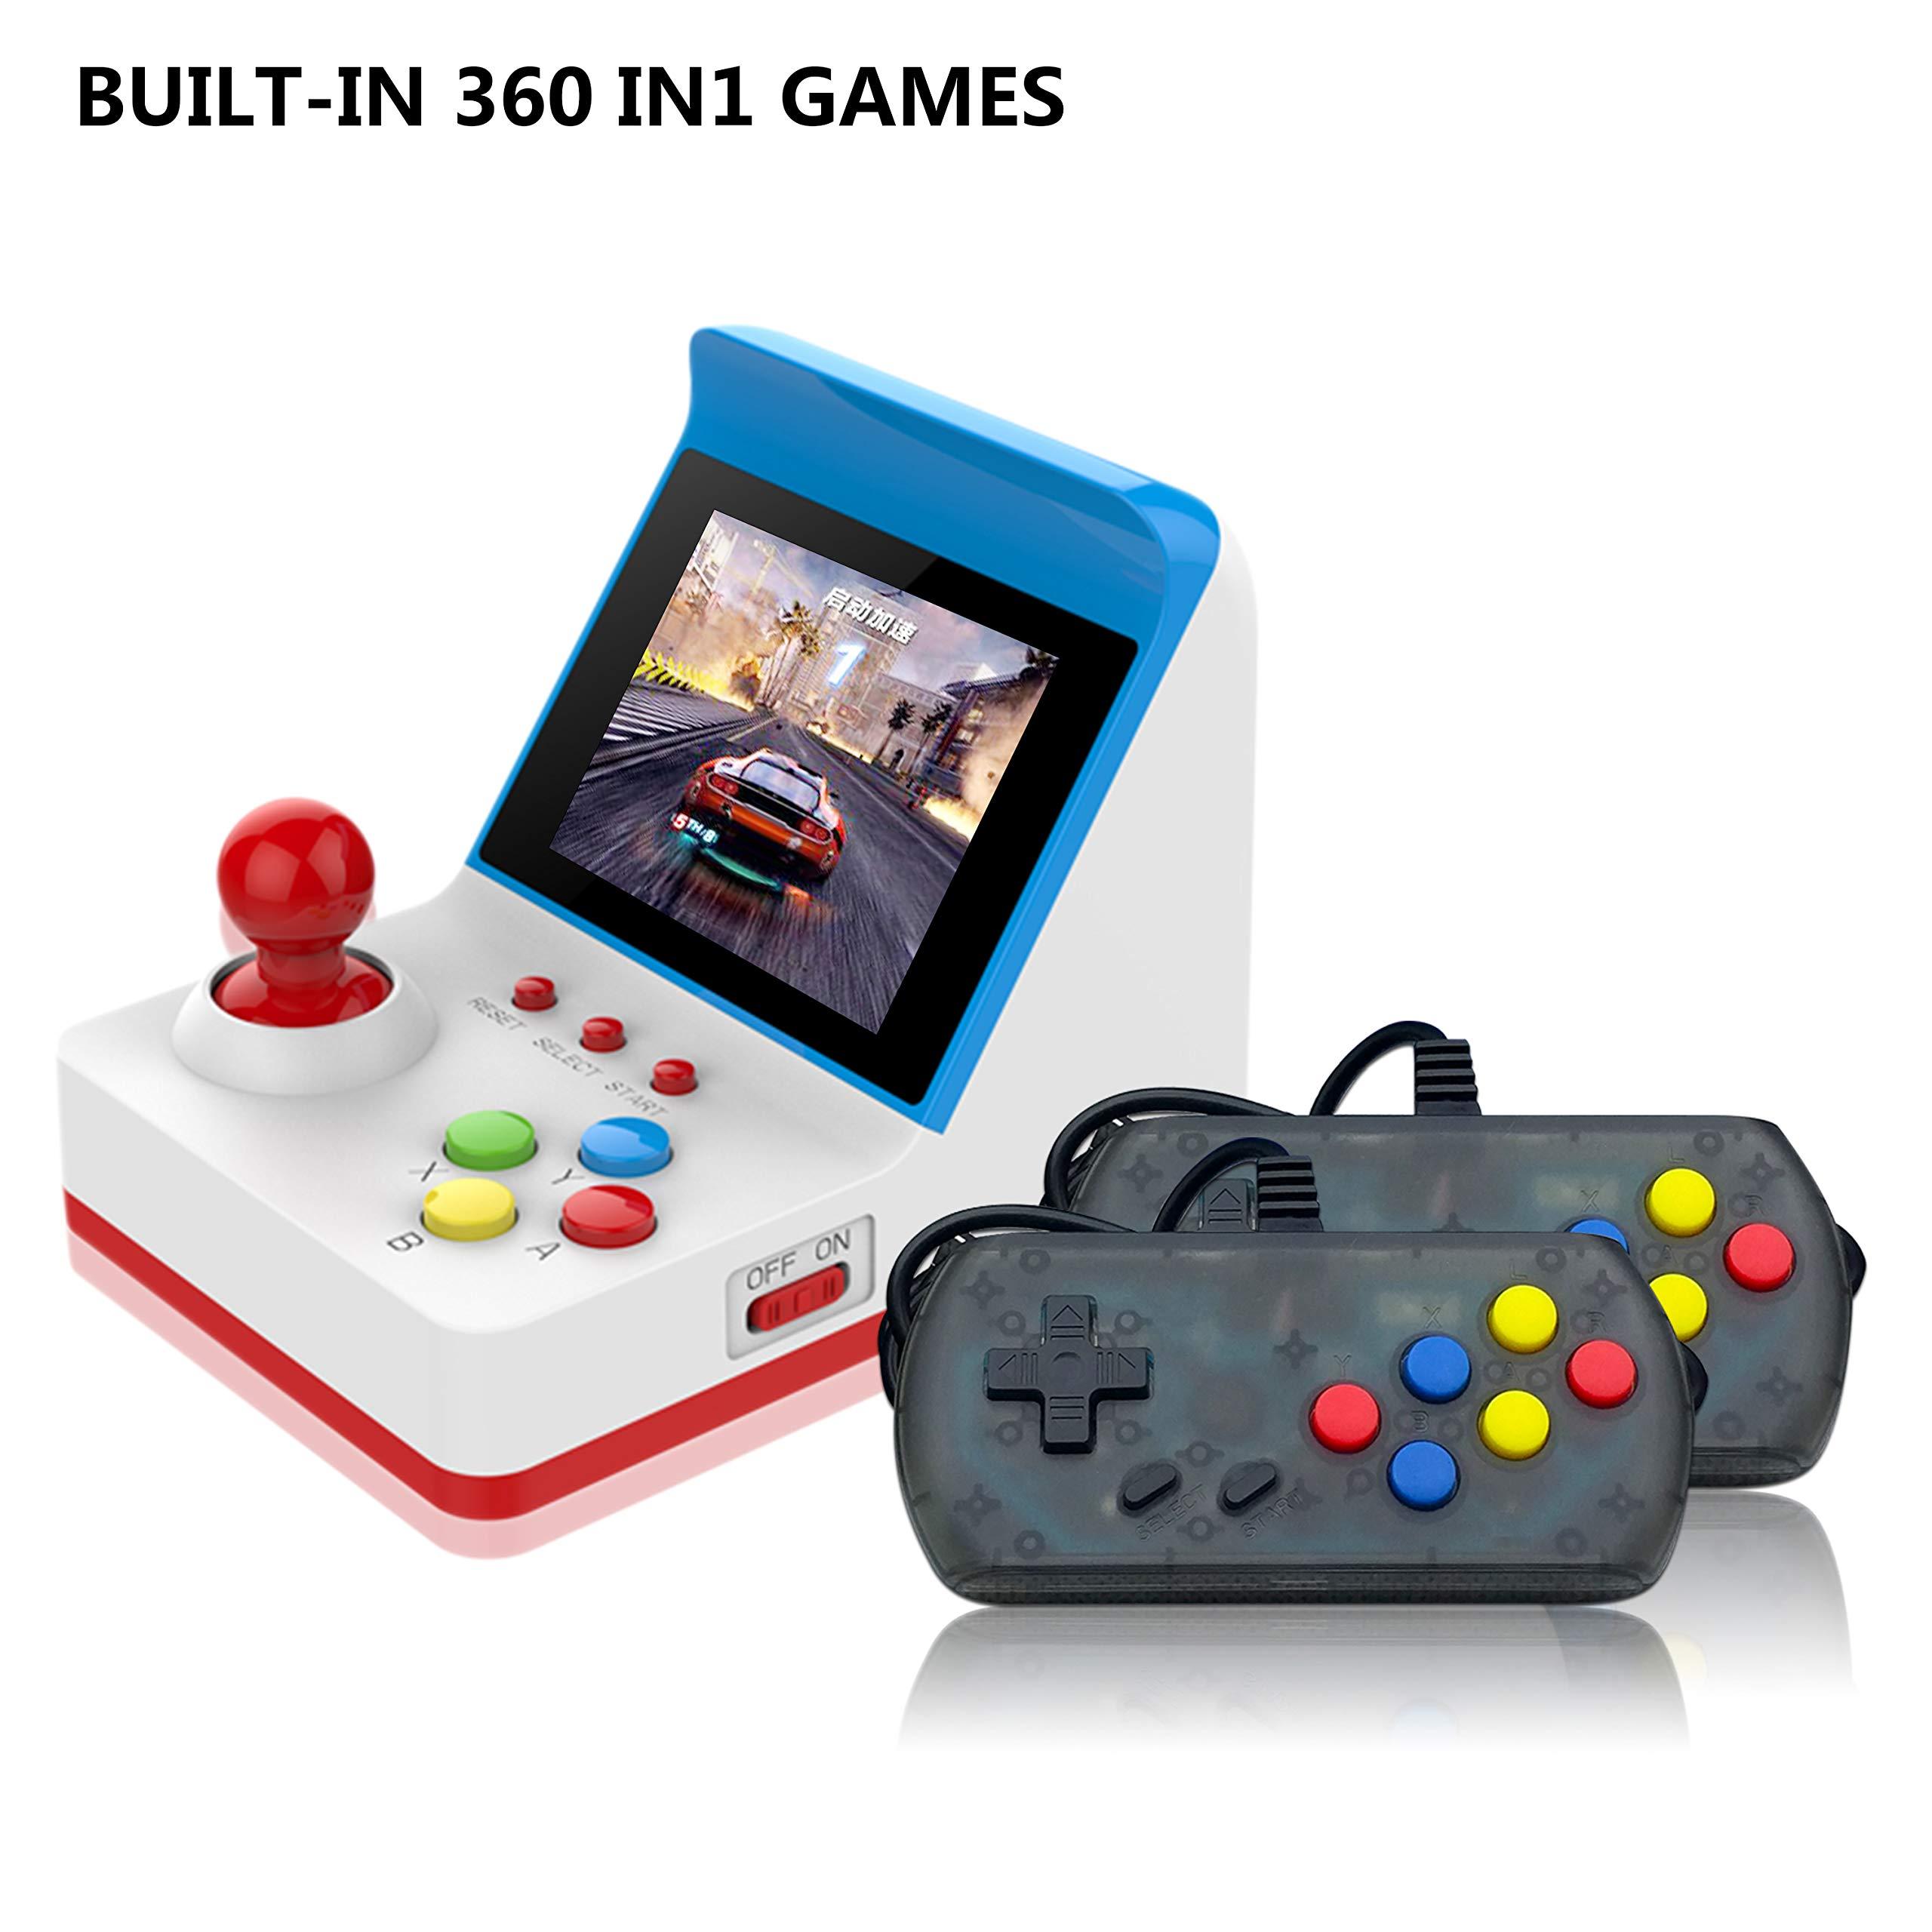 BAORUITENG Handheld Game Console, Retro FC Game Console Video Game Console with 3 Inch 360 Classic Games with 2 Joysticks , Birthday Present for Children (red) by BAORUITENG (Image #1)